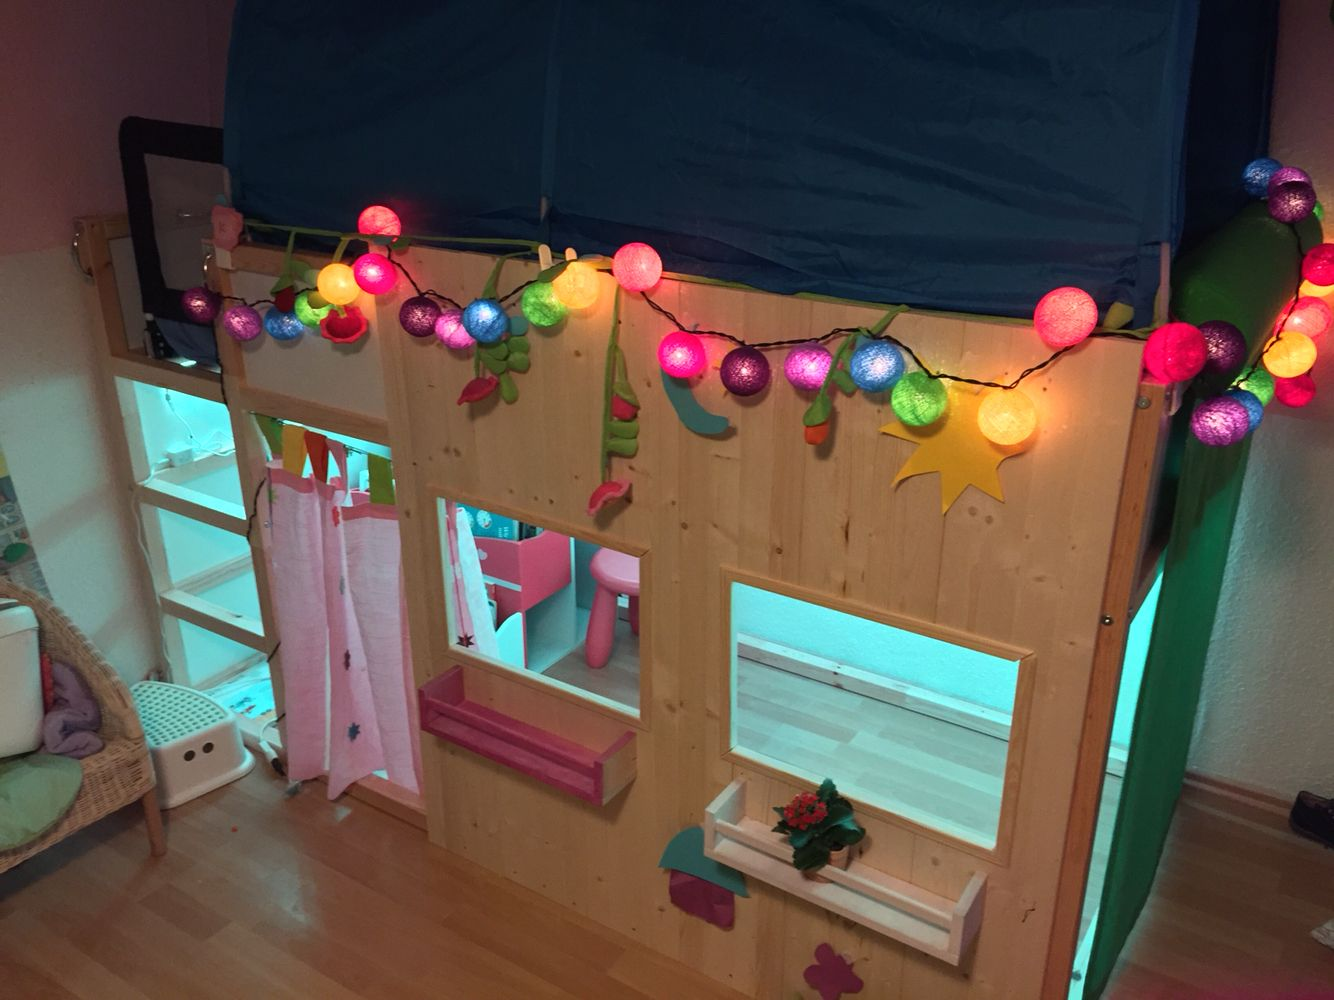 ikea kura bett camera bimbi pinterest kinderzimmer m dchenzimmer und bett. Black Bedroom Furniture Sets. Home Design Ideas